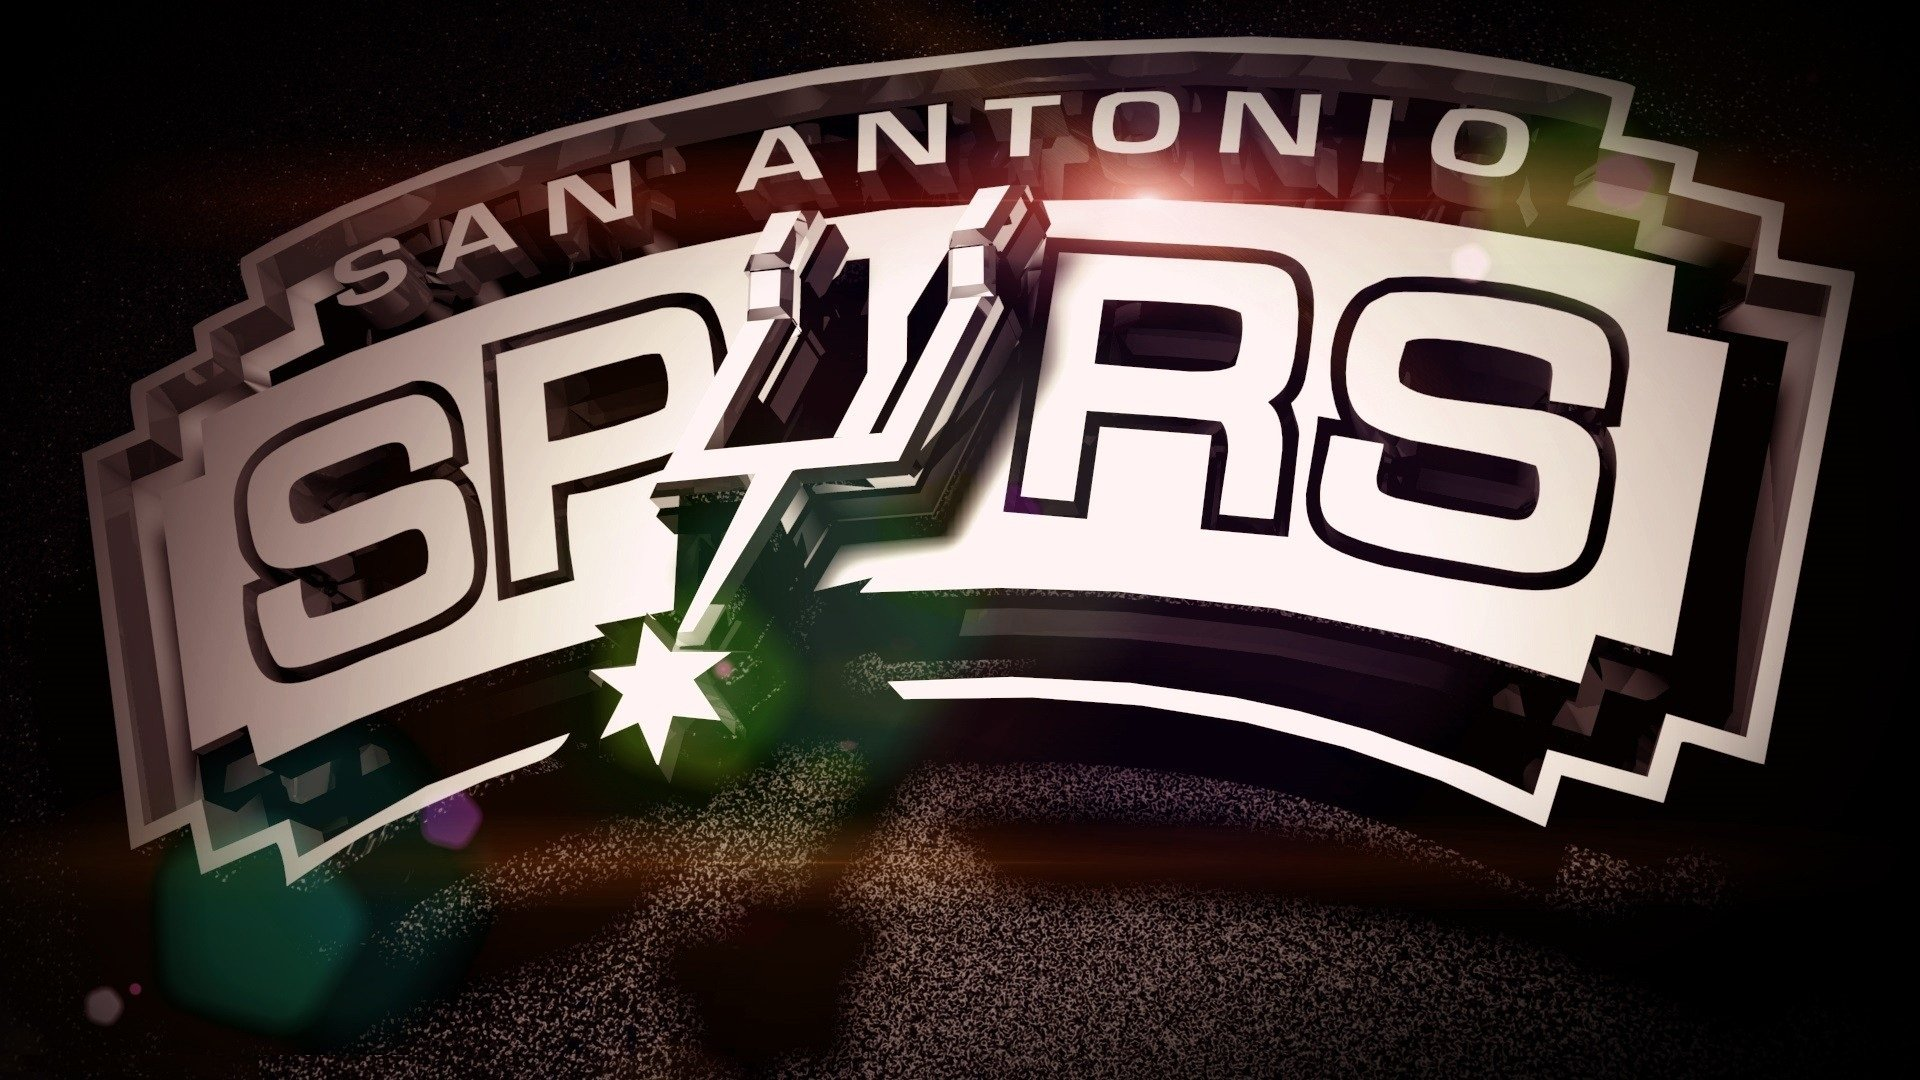 San Antonio Spurs Full HD Wallpaper